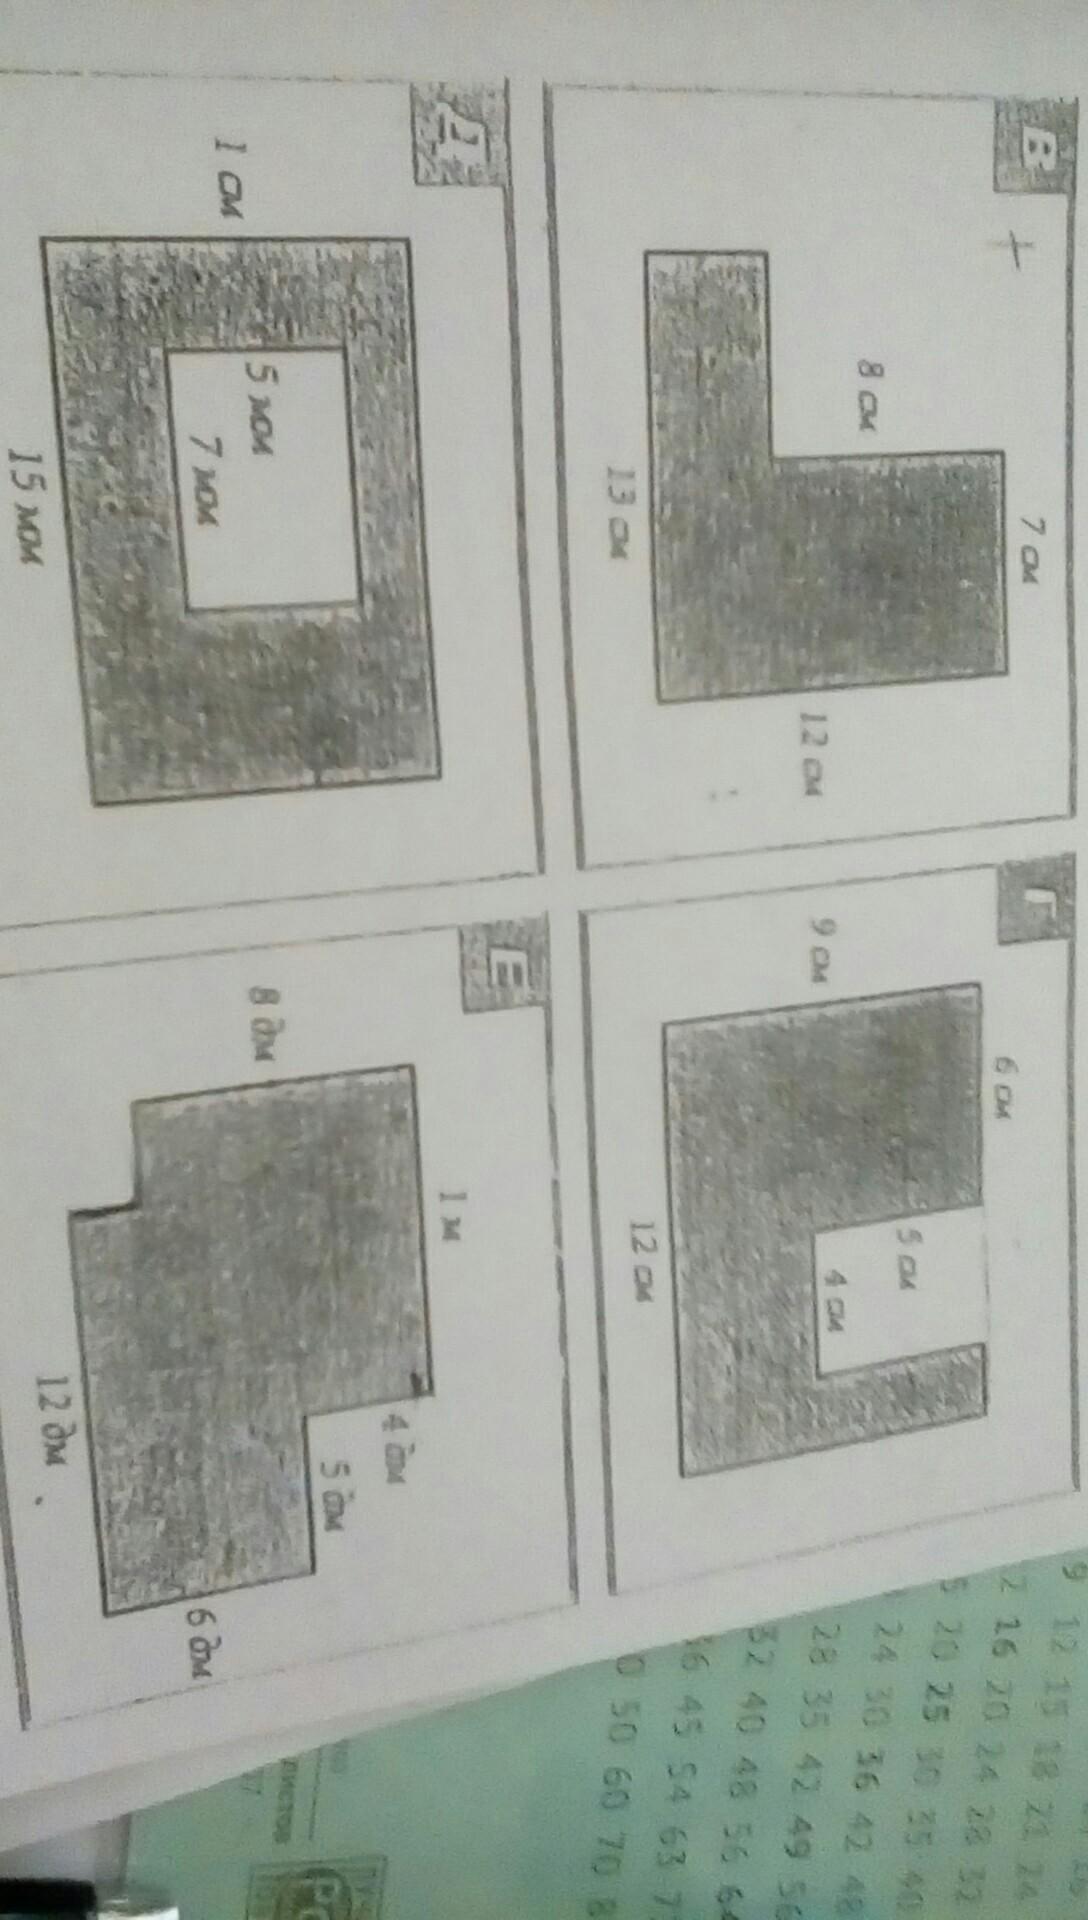 Помогите даю 20 баллов надо найти площадь каждой фигуры